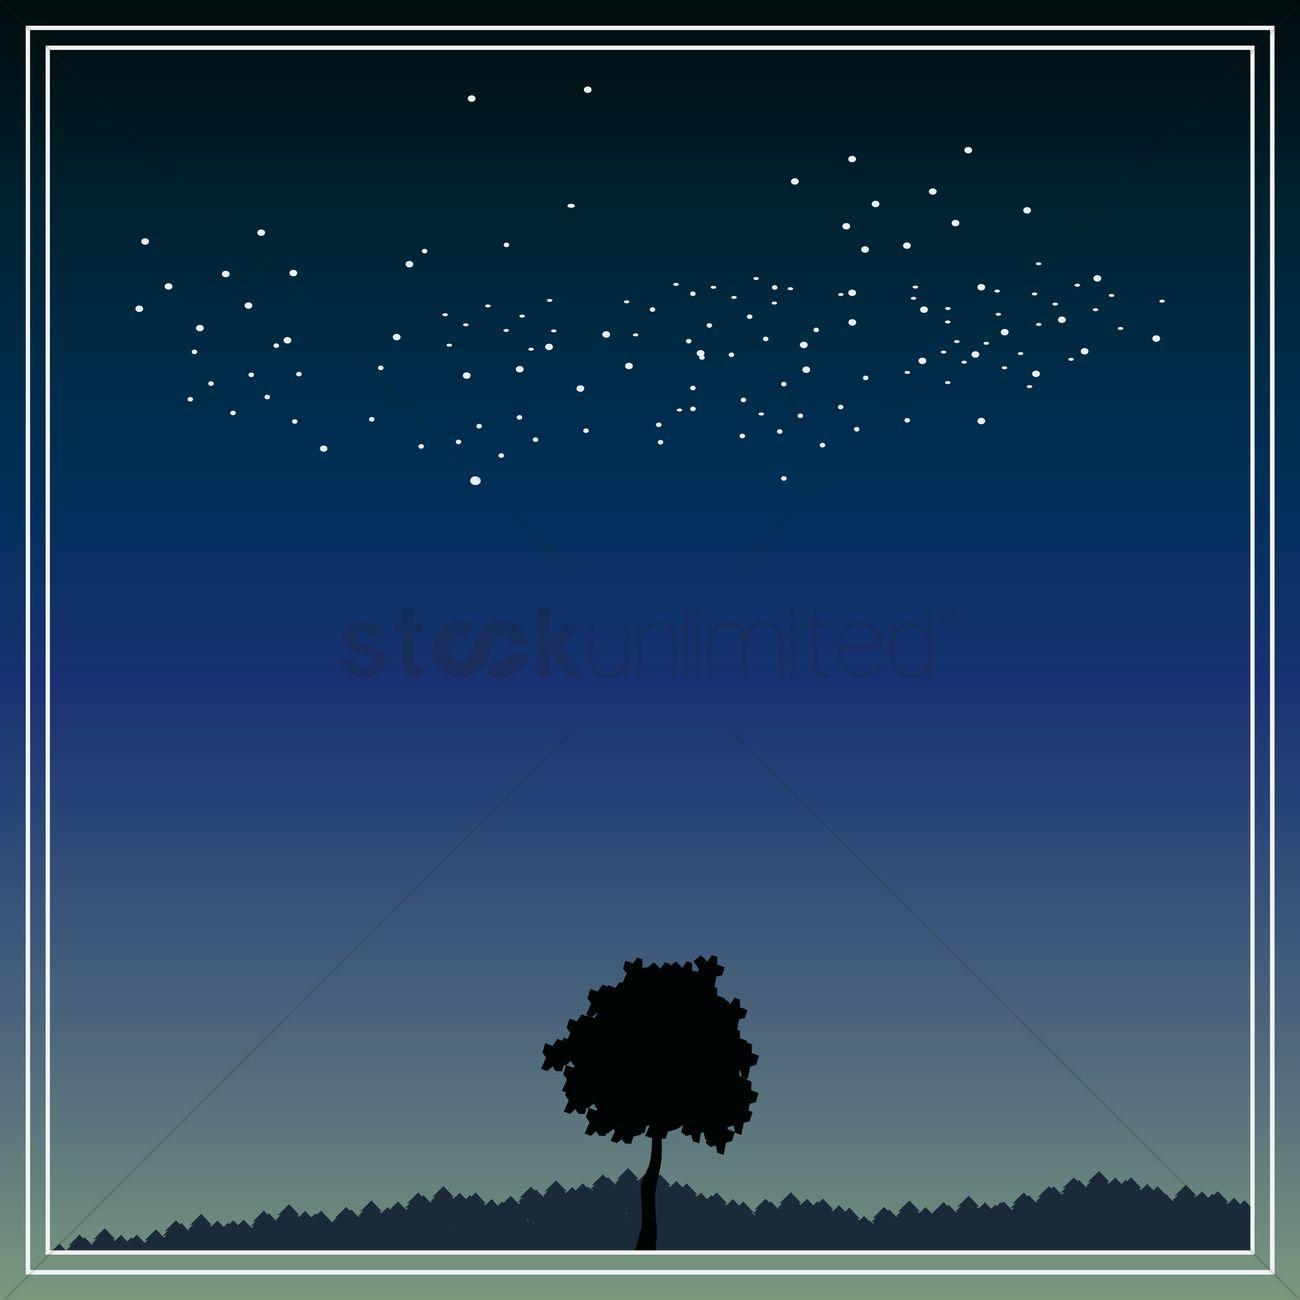 Night sky background design Vector Image - 1975441 | StockUnlimited